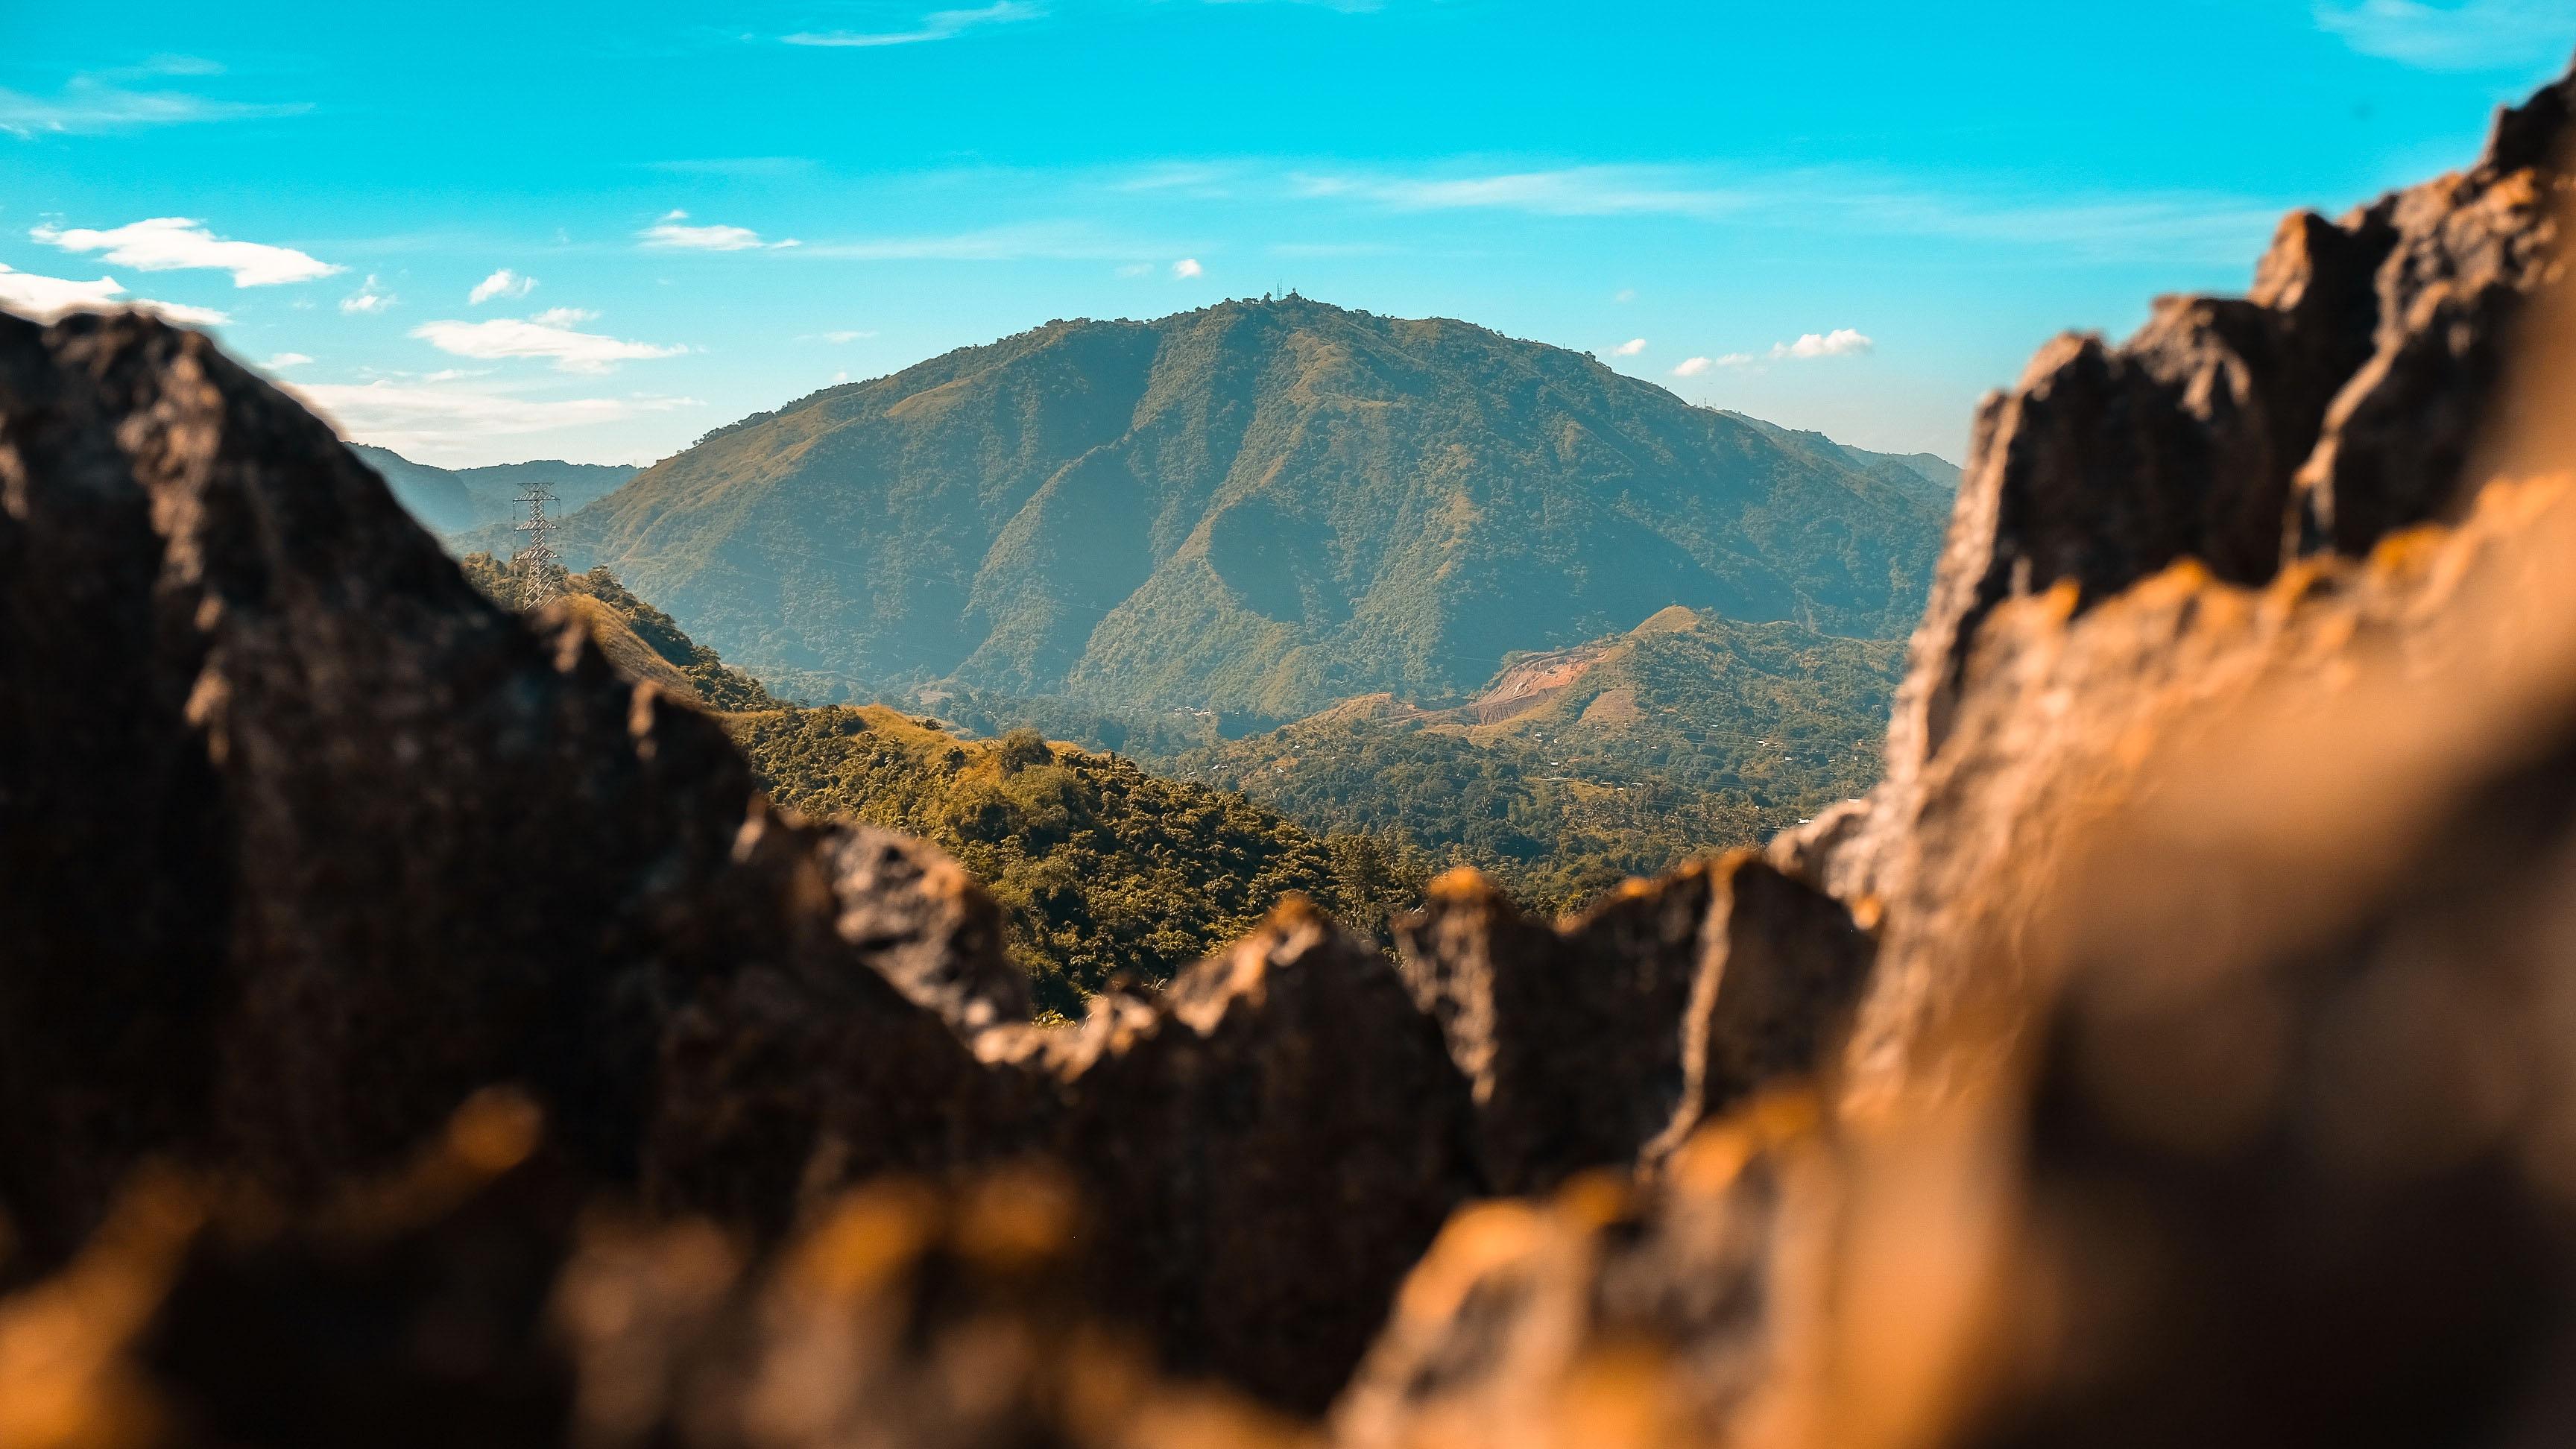 brown rock mountain near mountain